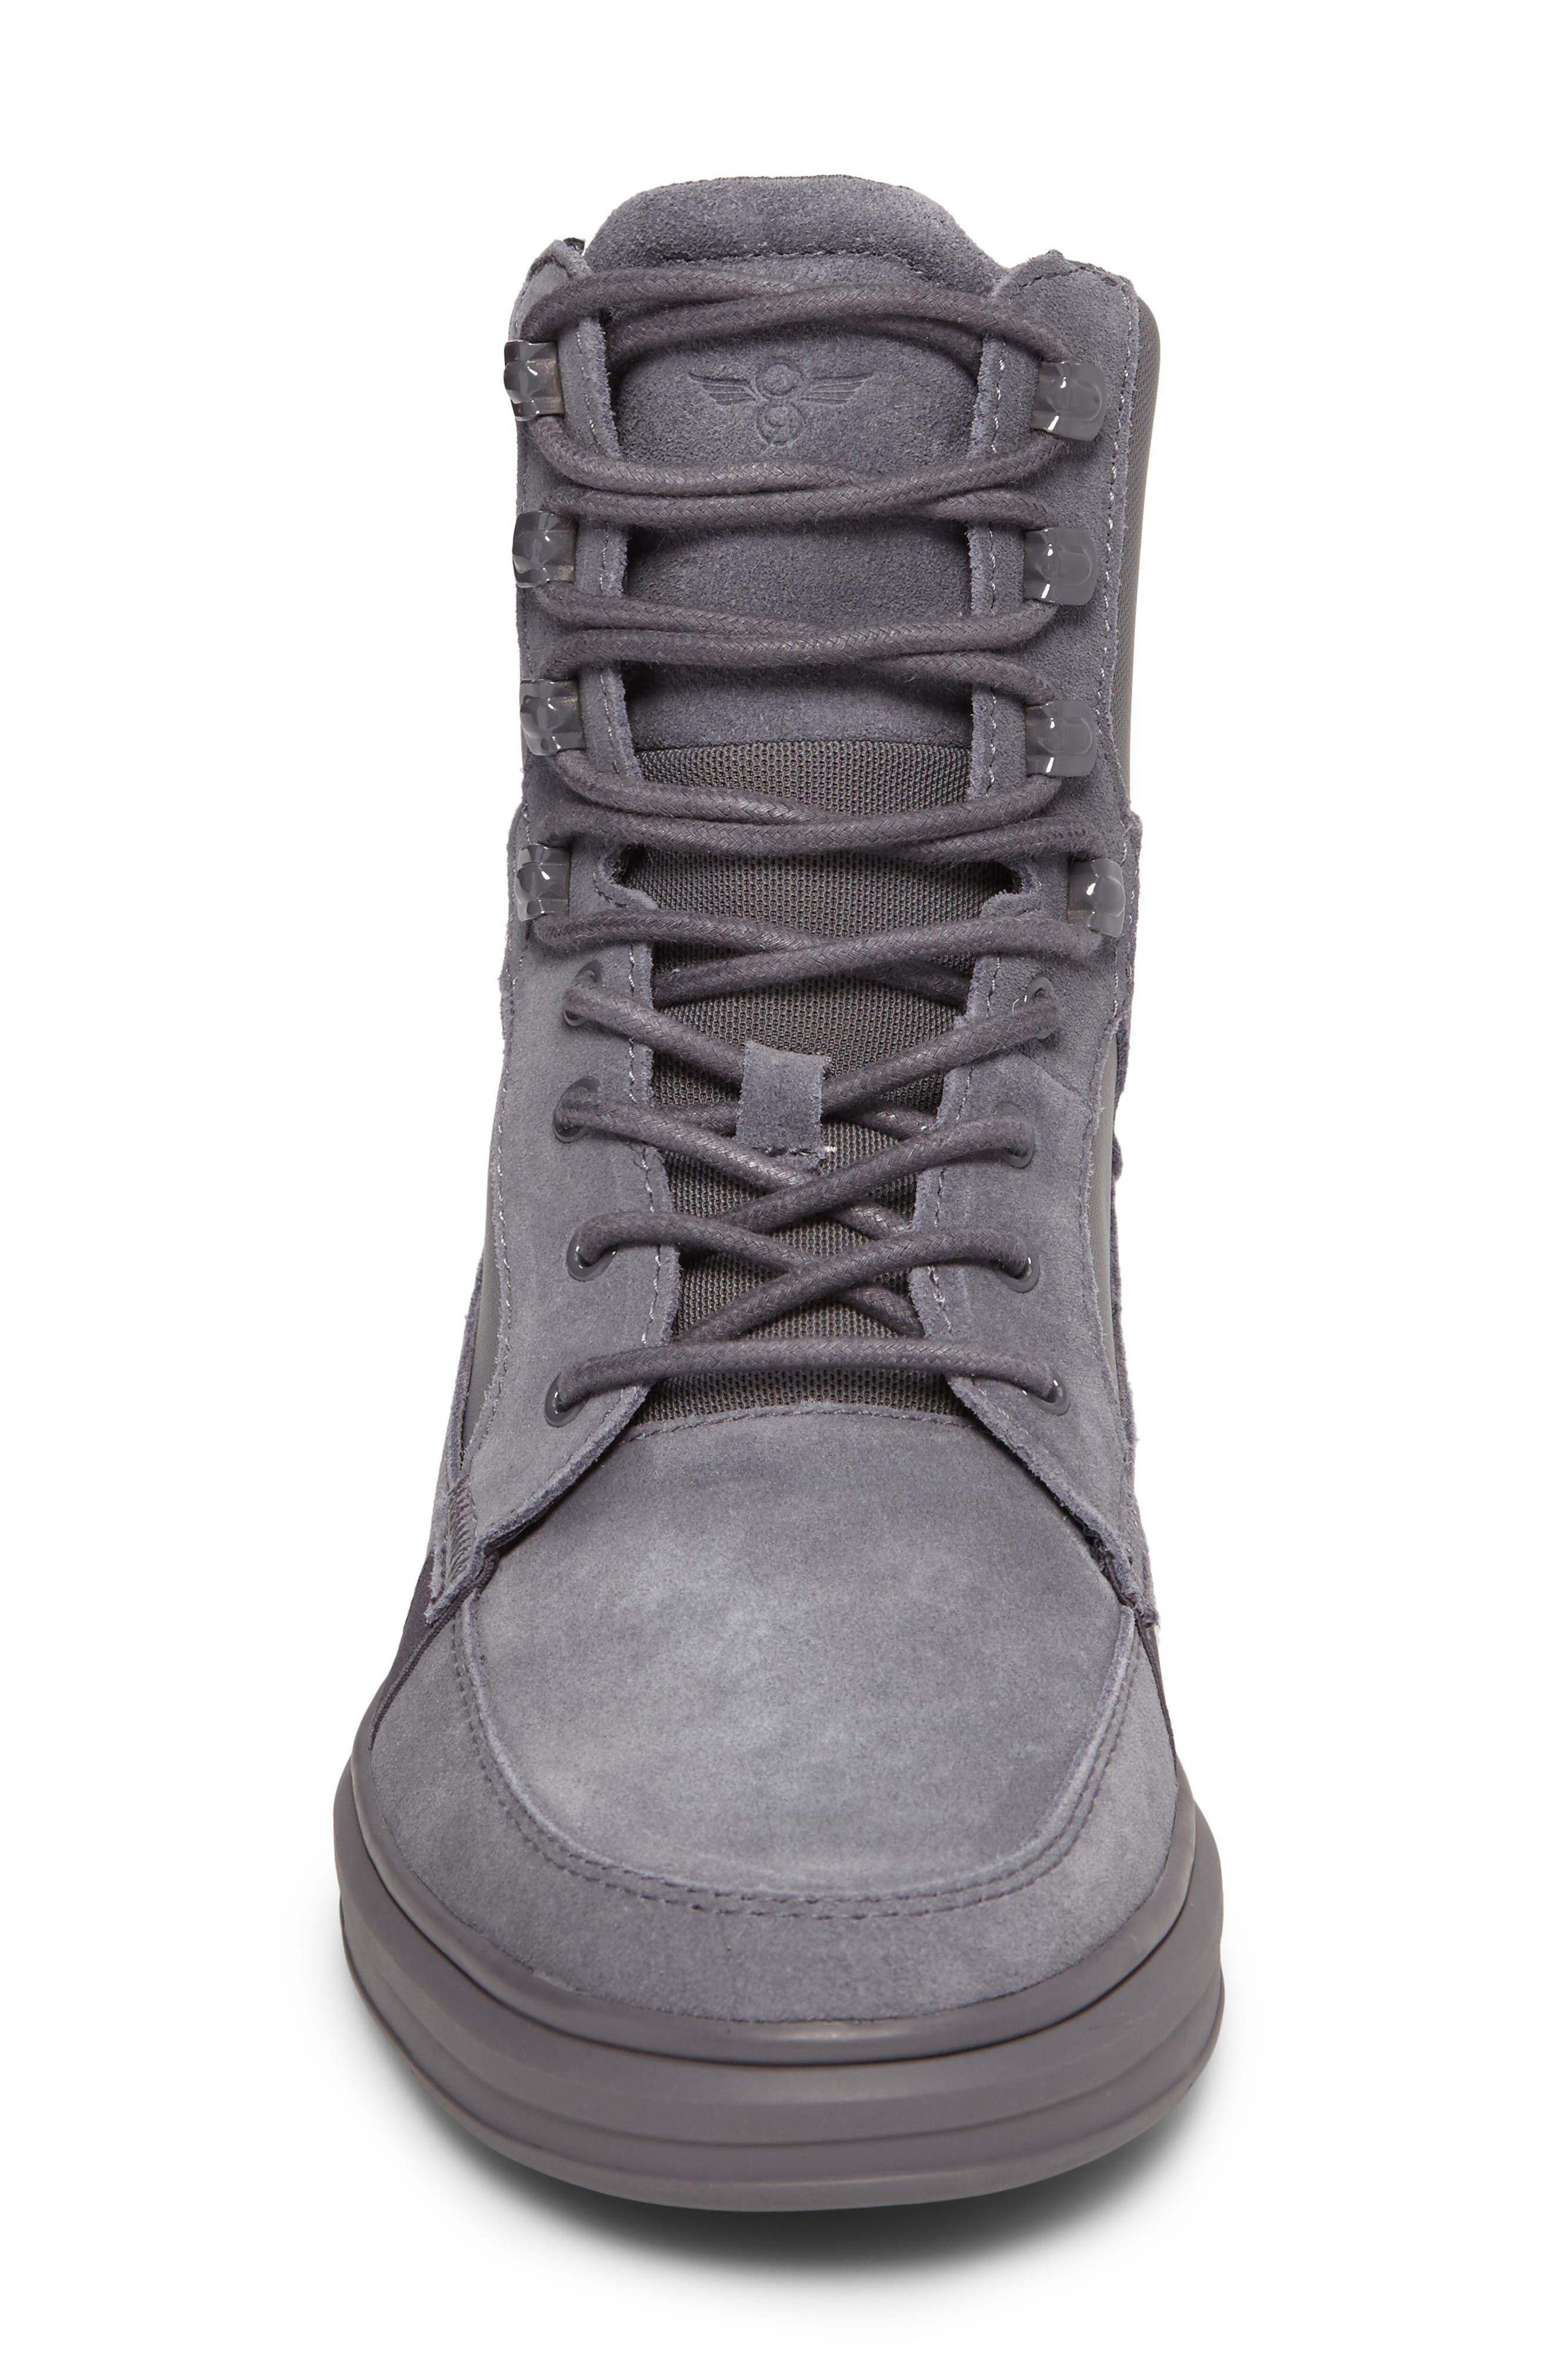 Desimo Sneaker,                             Alternate thumbnail 4, color,                             Smoke Leather